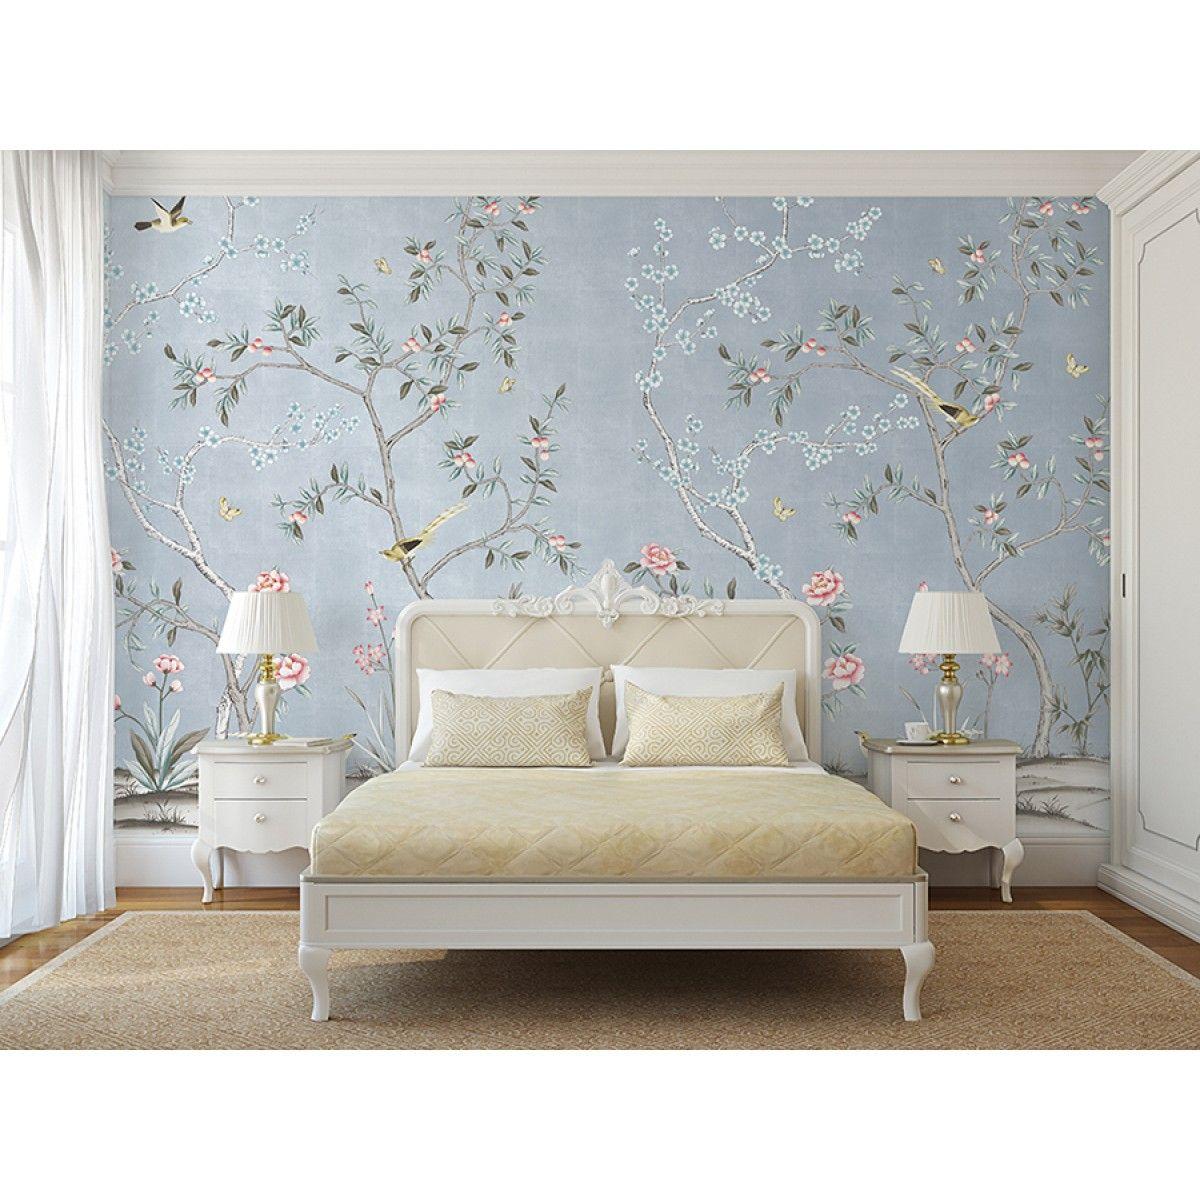 CHINOISERIE Garden Metallic Ice Blue | DIY ... OMG | Pinterest ...